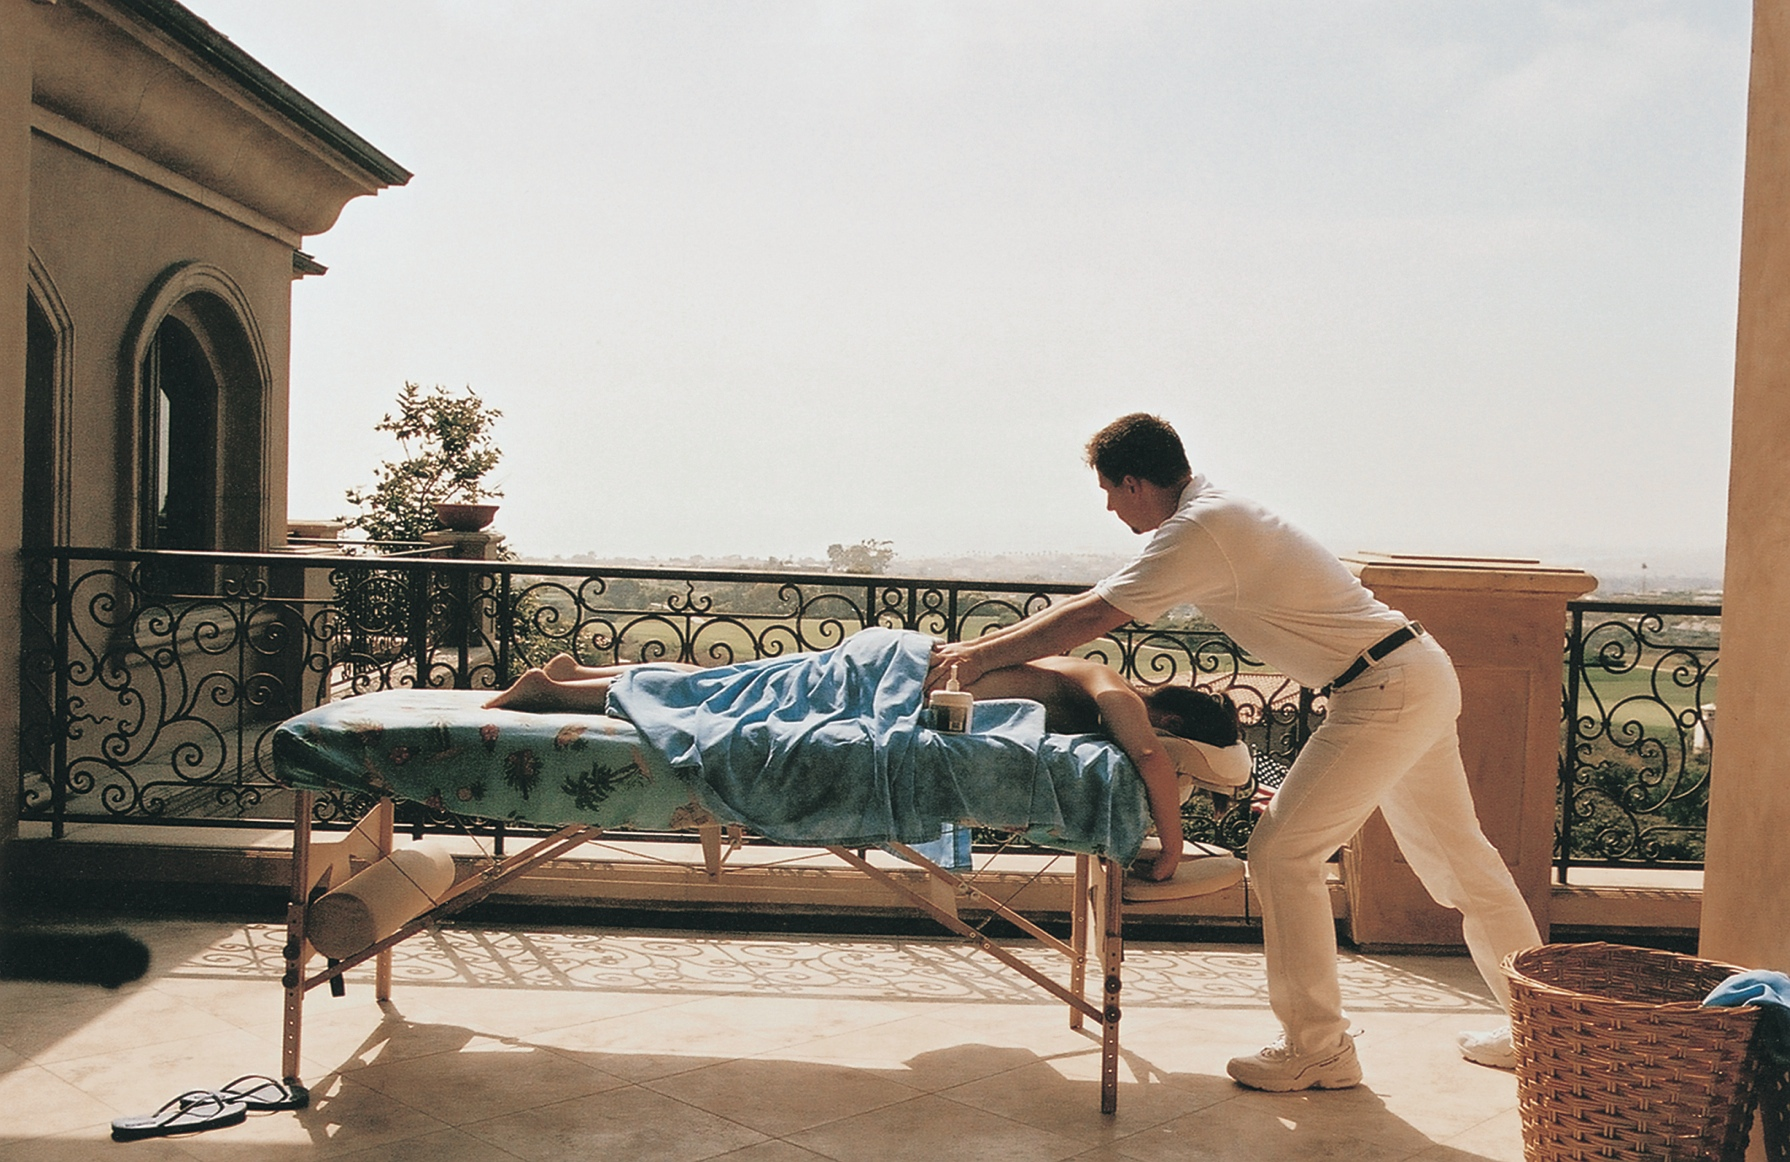 massage spa day bachelorette party